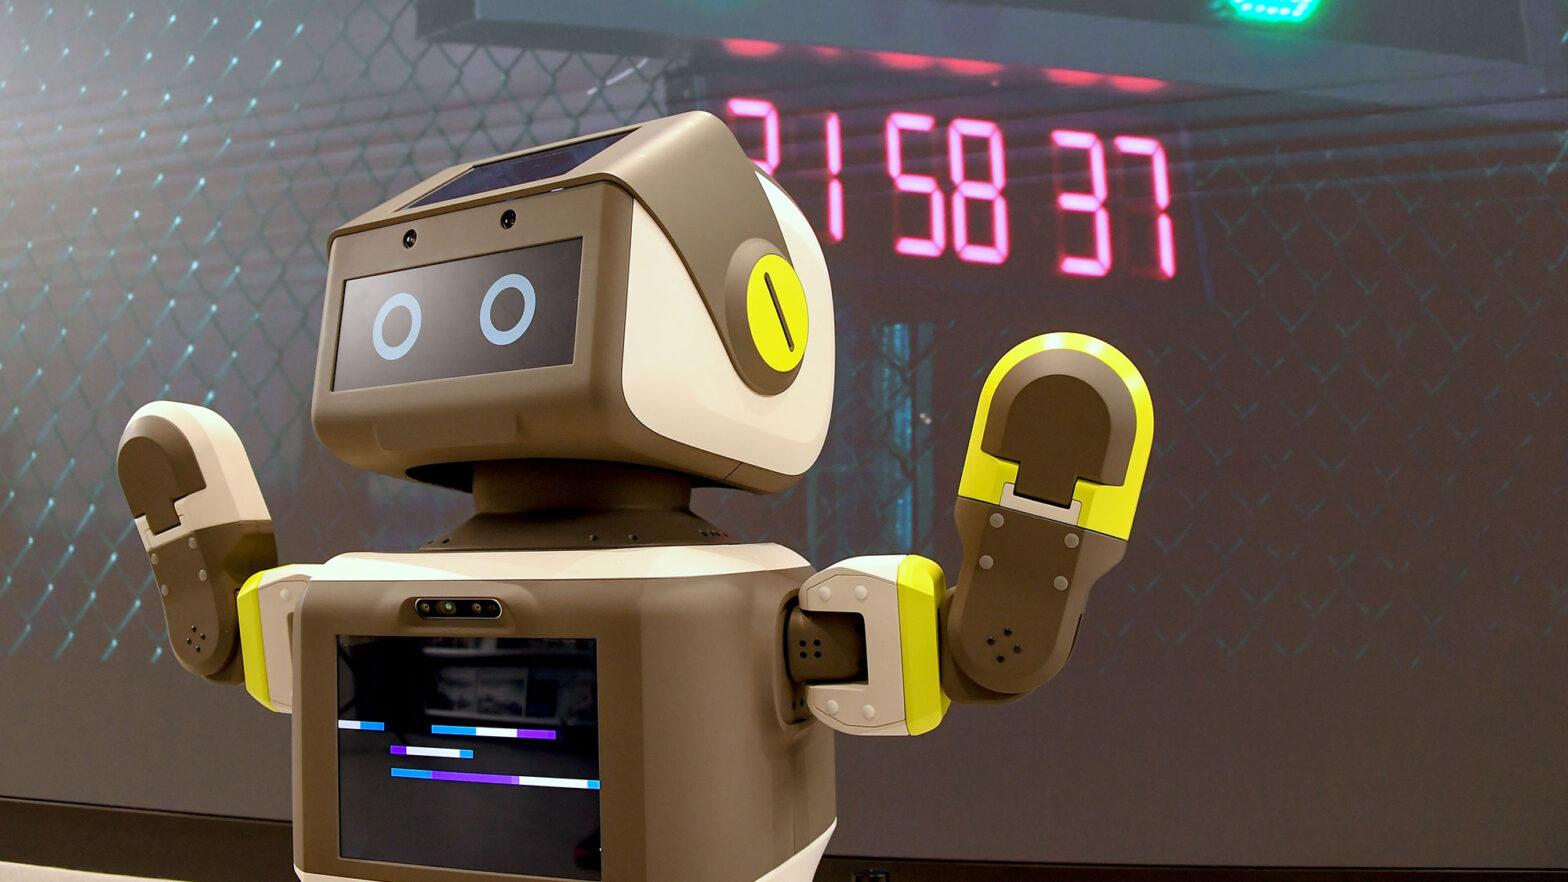 Hyundai Motor Group Customer Service Robot